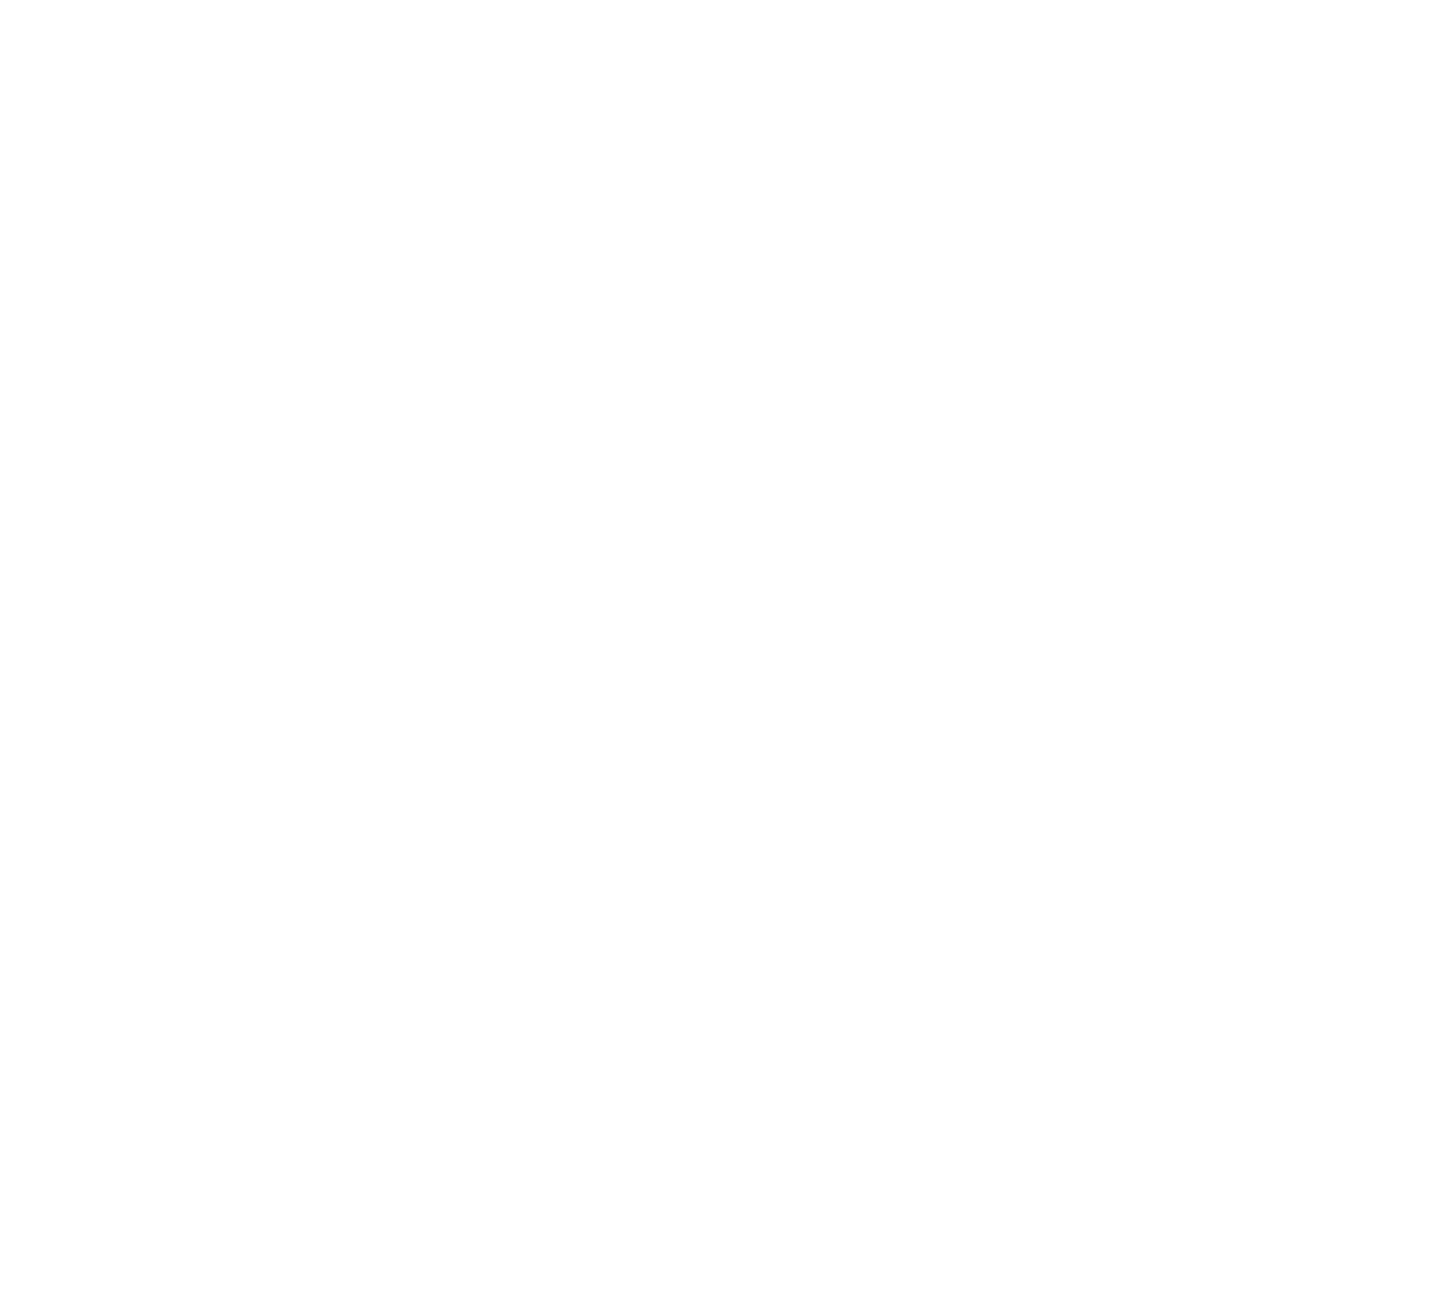 Elektrovergussmasse Elektronik vergie/ßen isolieren 1250g, Silbergrau BEKATEQ BK-250EP 2K Vergussmasse Elektronik Gie/ßharz Elektro Vergussmasse